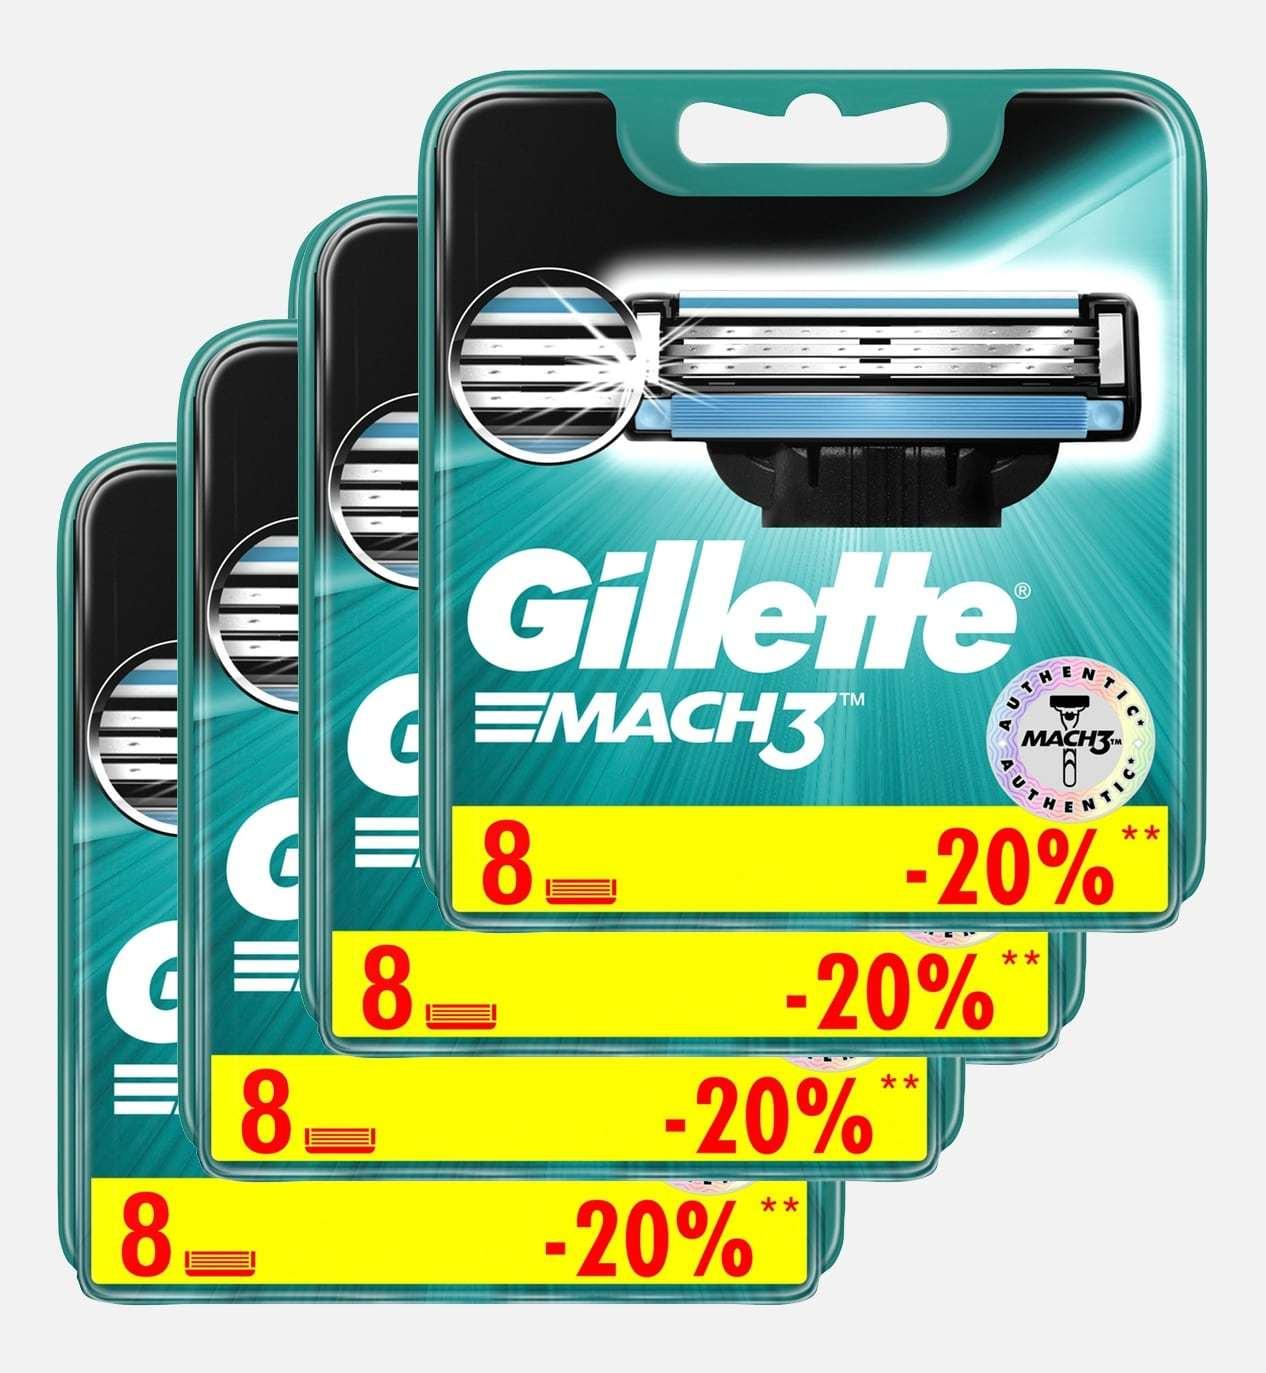 Gillette mach3 комплект (4х8) 32 шт. (Цена за 1 пачку 810р.)